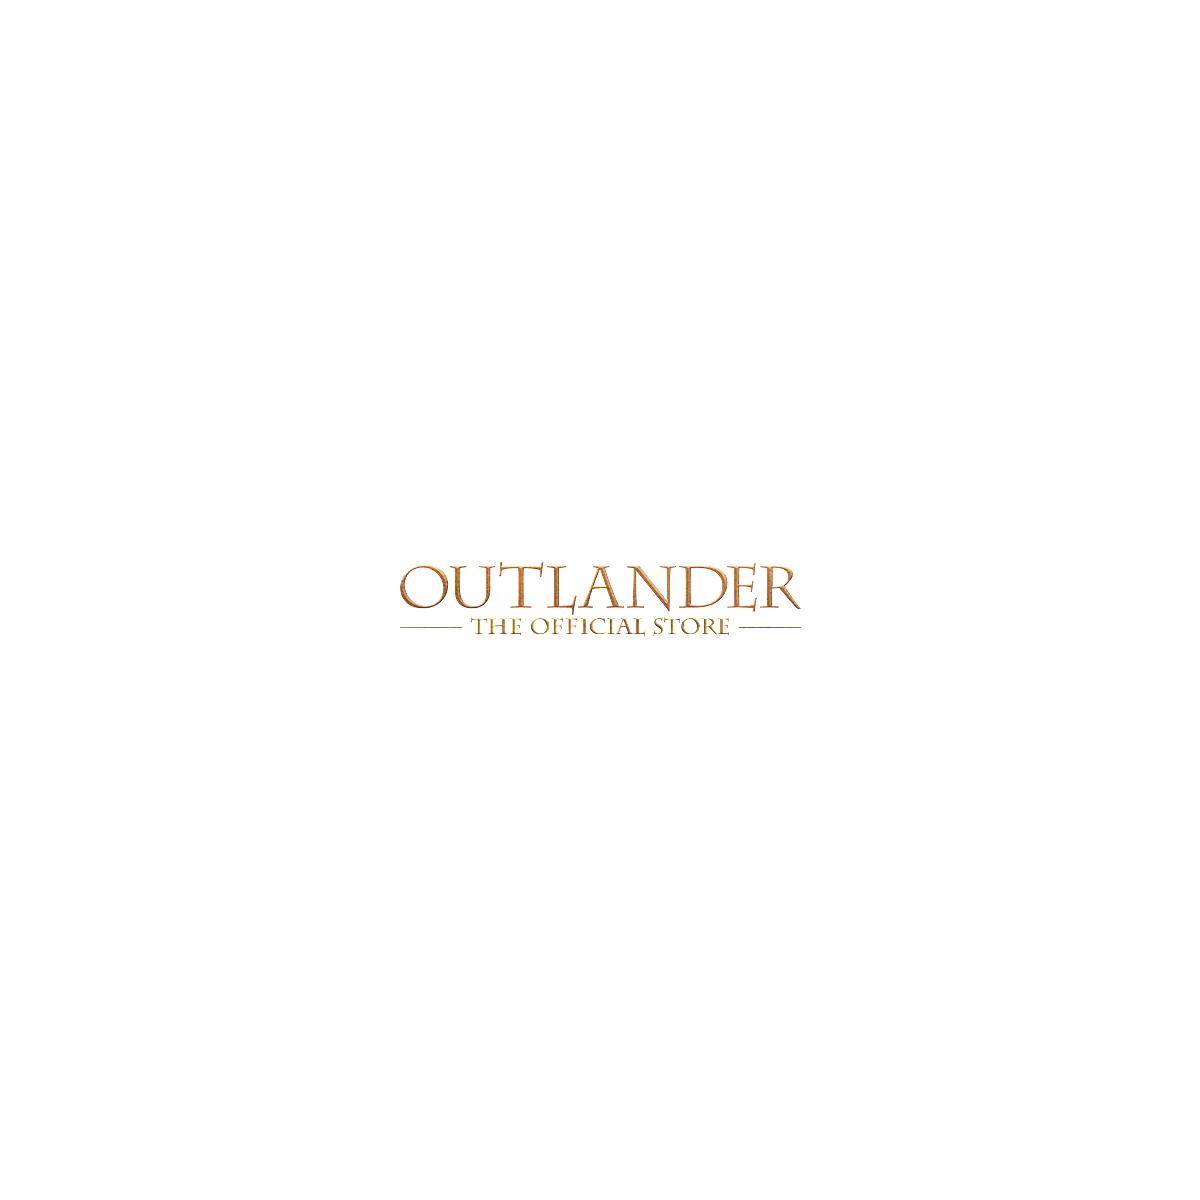 OutlanderStore